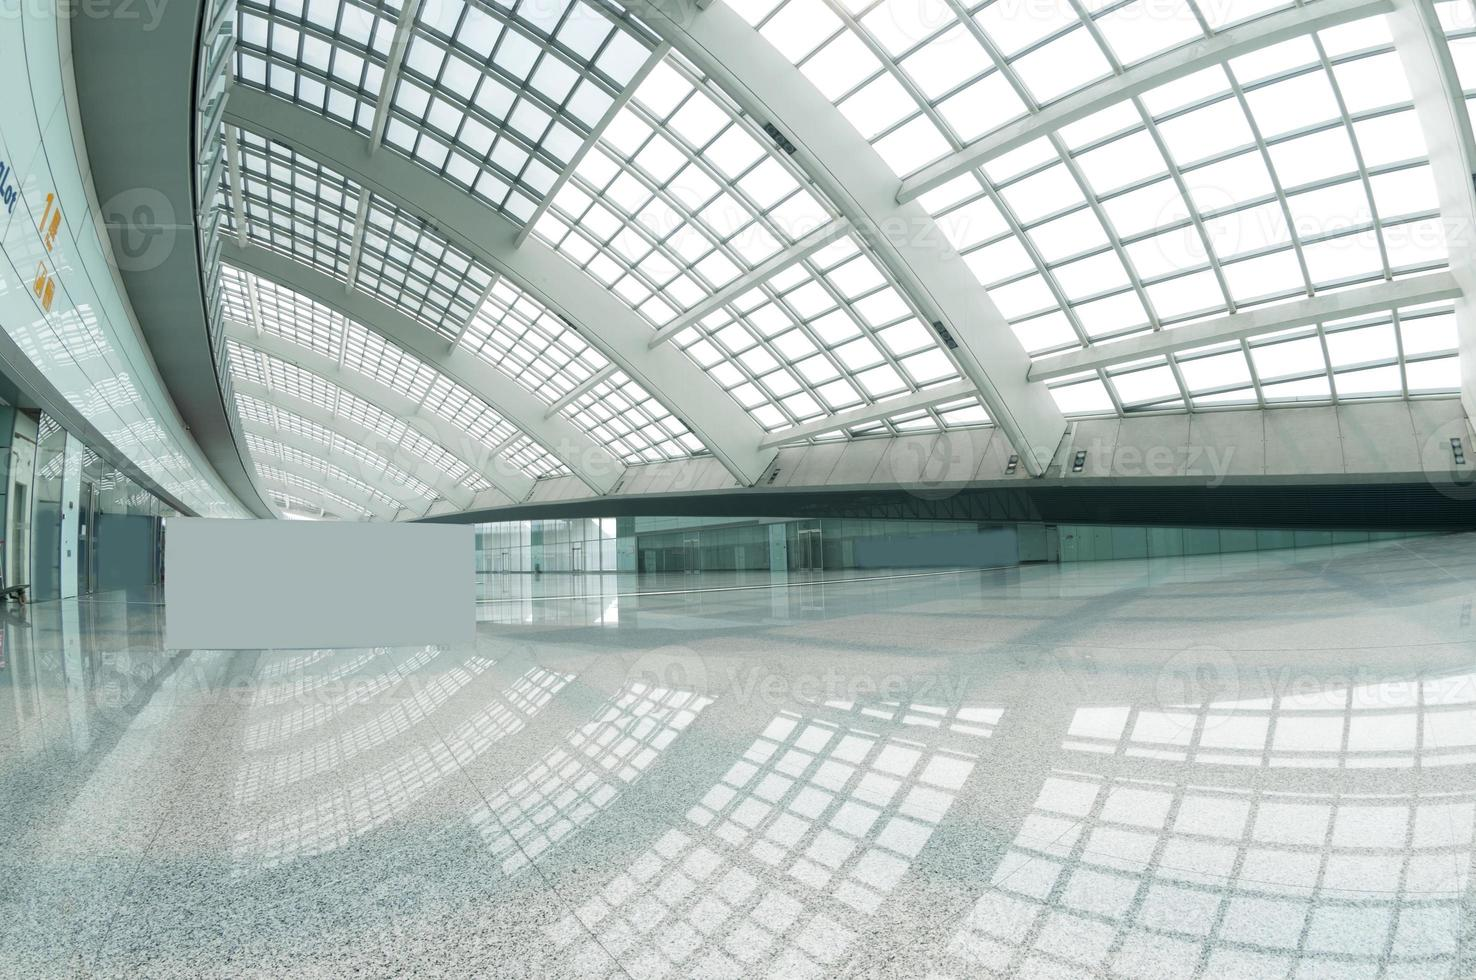 modern mall of beijin airport subway station. photo